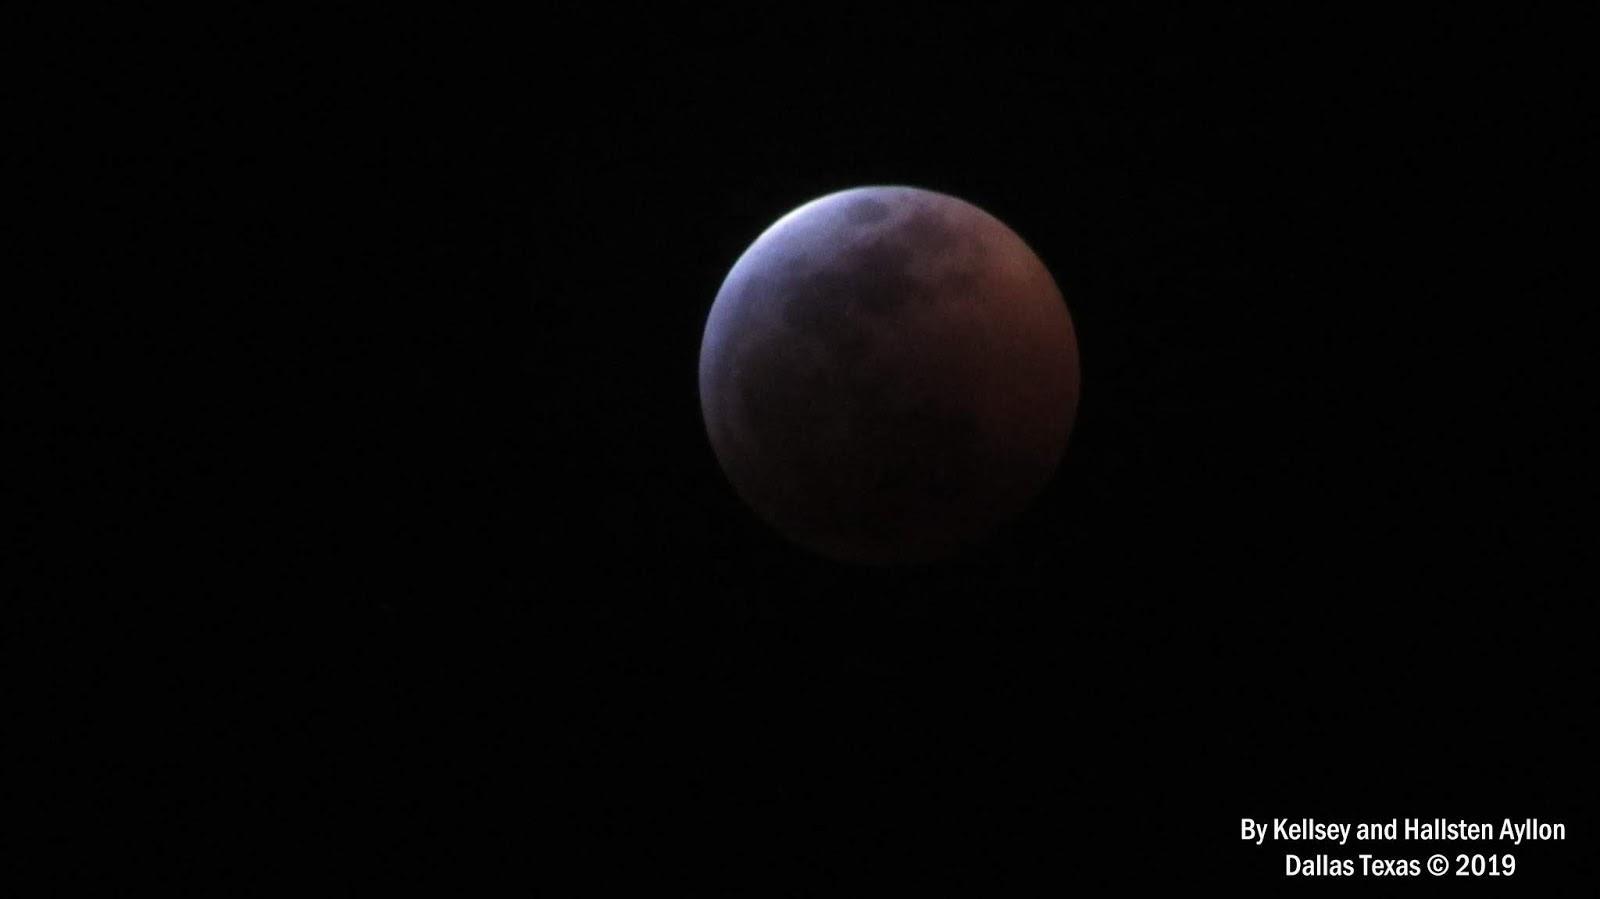 blood moon january 2019 dallas tx - photo #12